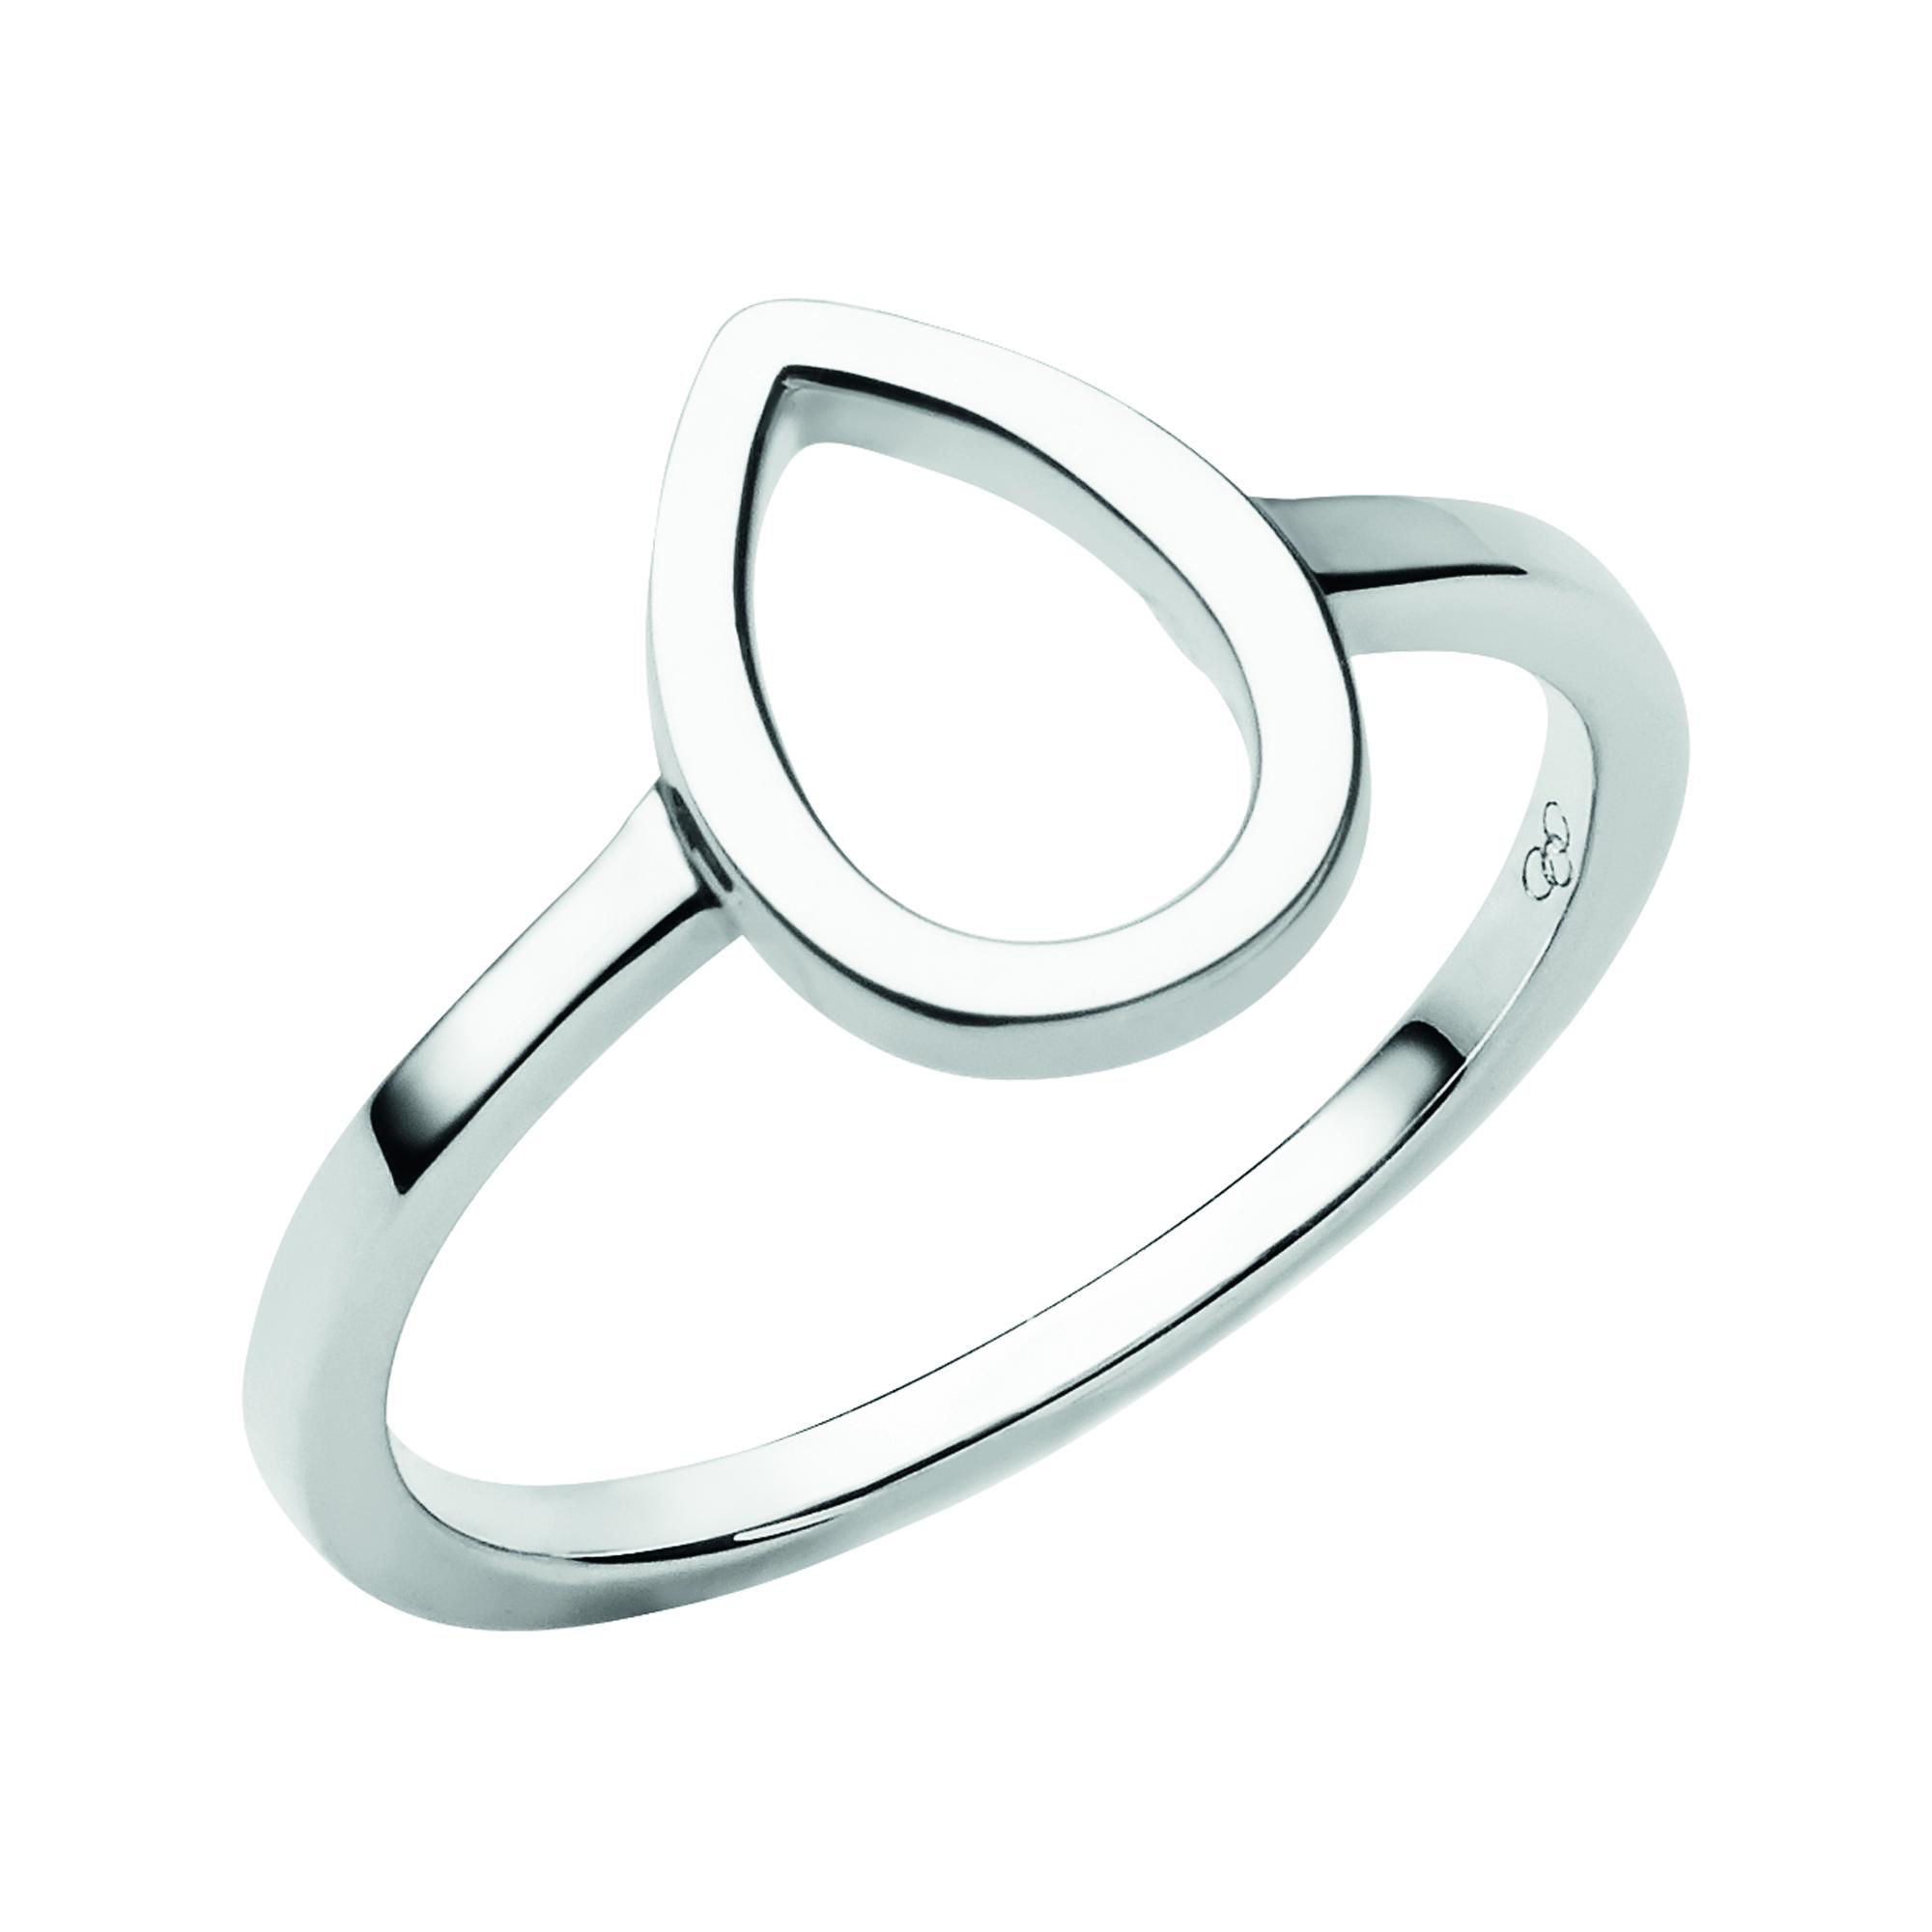 LINKS OF LONDON - Ασημένιο δαχτυλίδι Flare- μεγέθος 56 γυναικεία αξεσουάρ κοσμήματα δαχτυλίδια